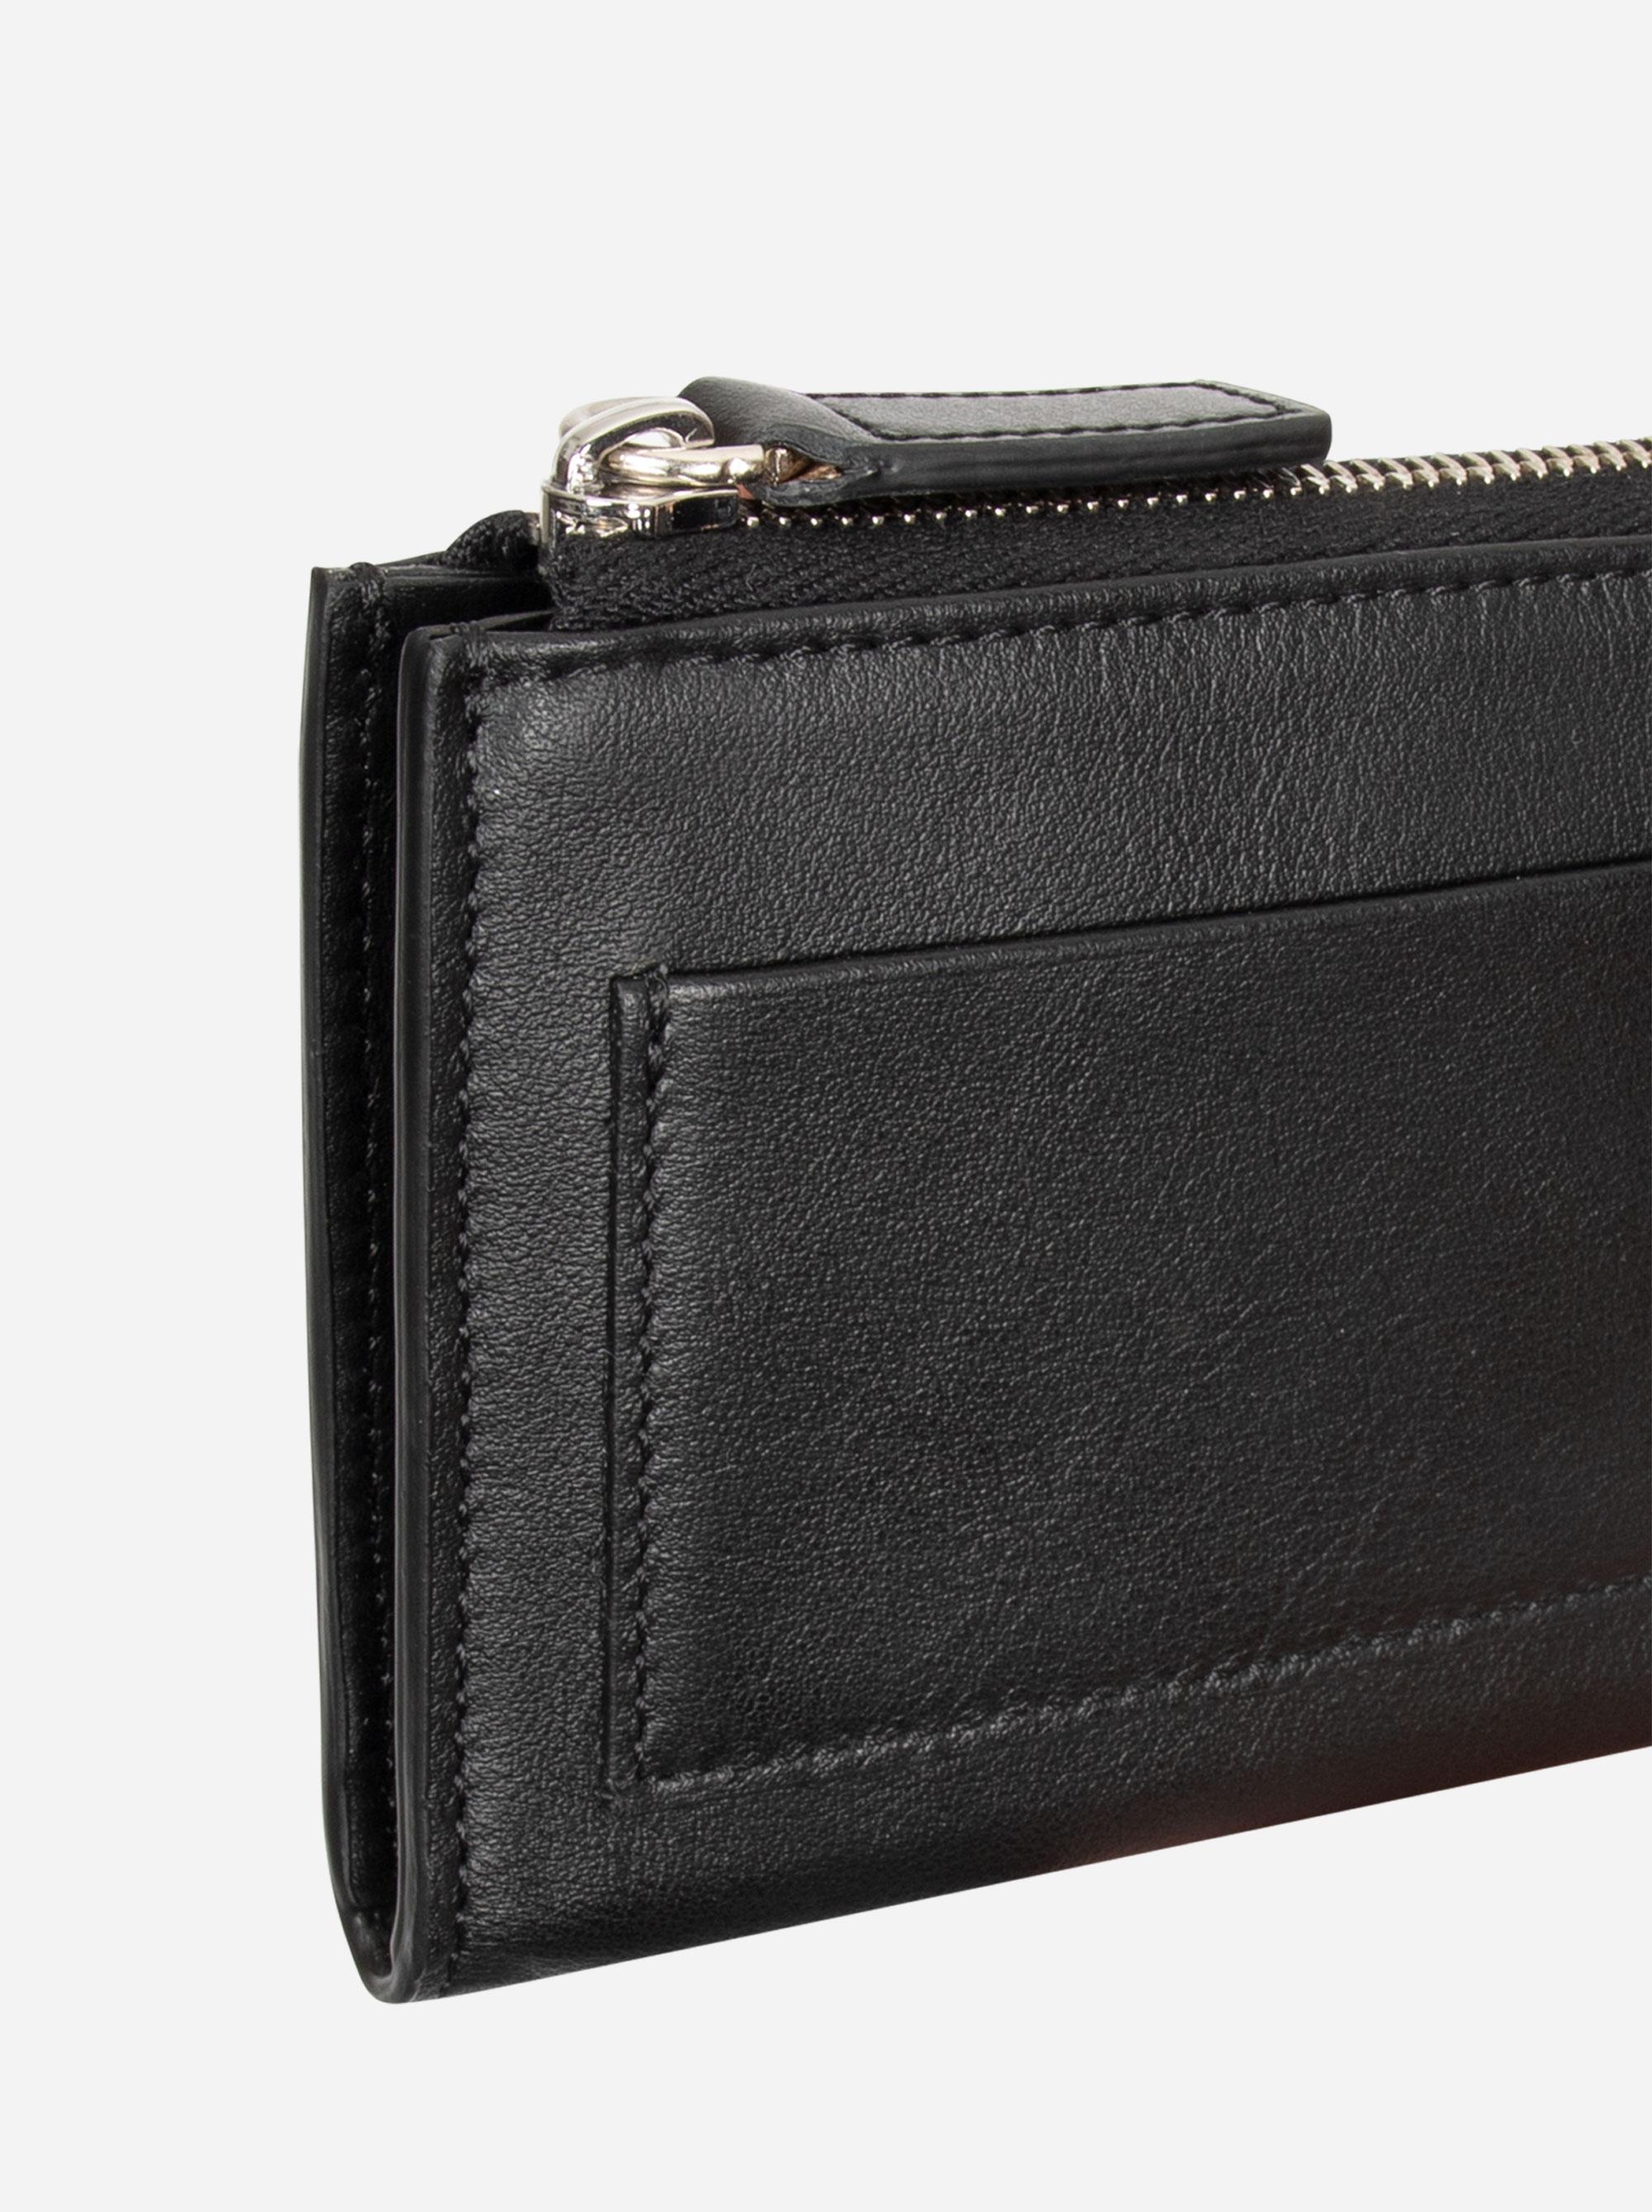 Teym - The Wallet - Black - 4